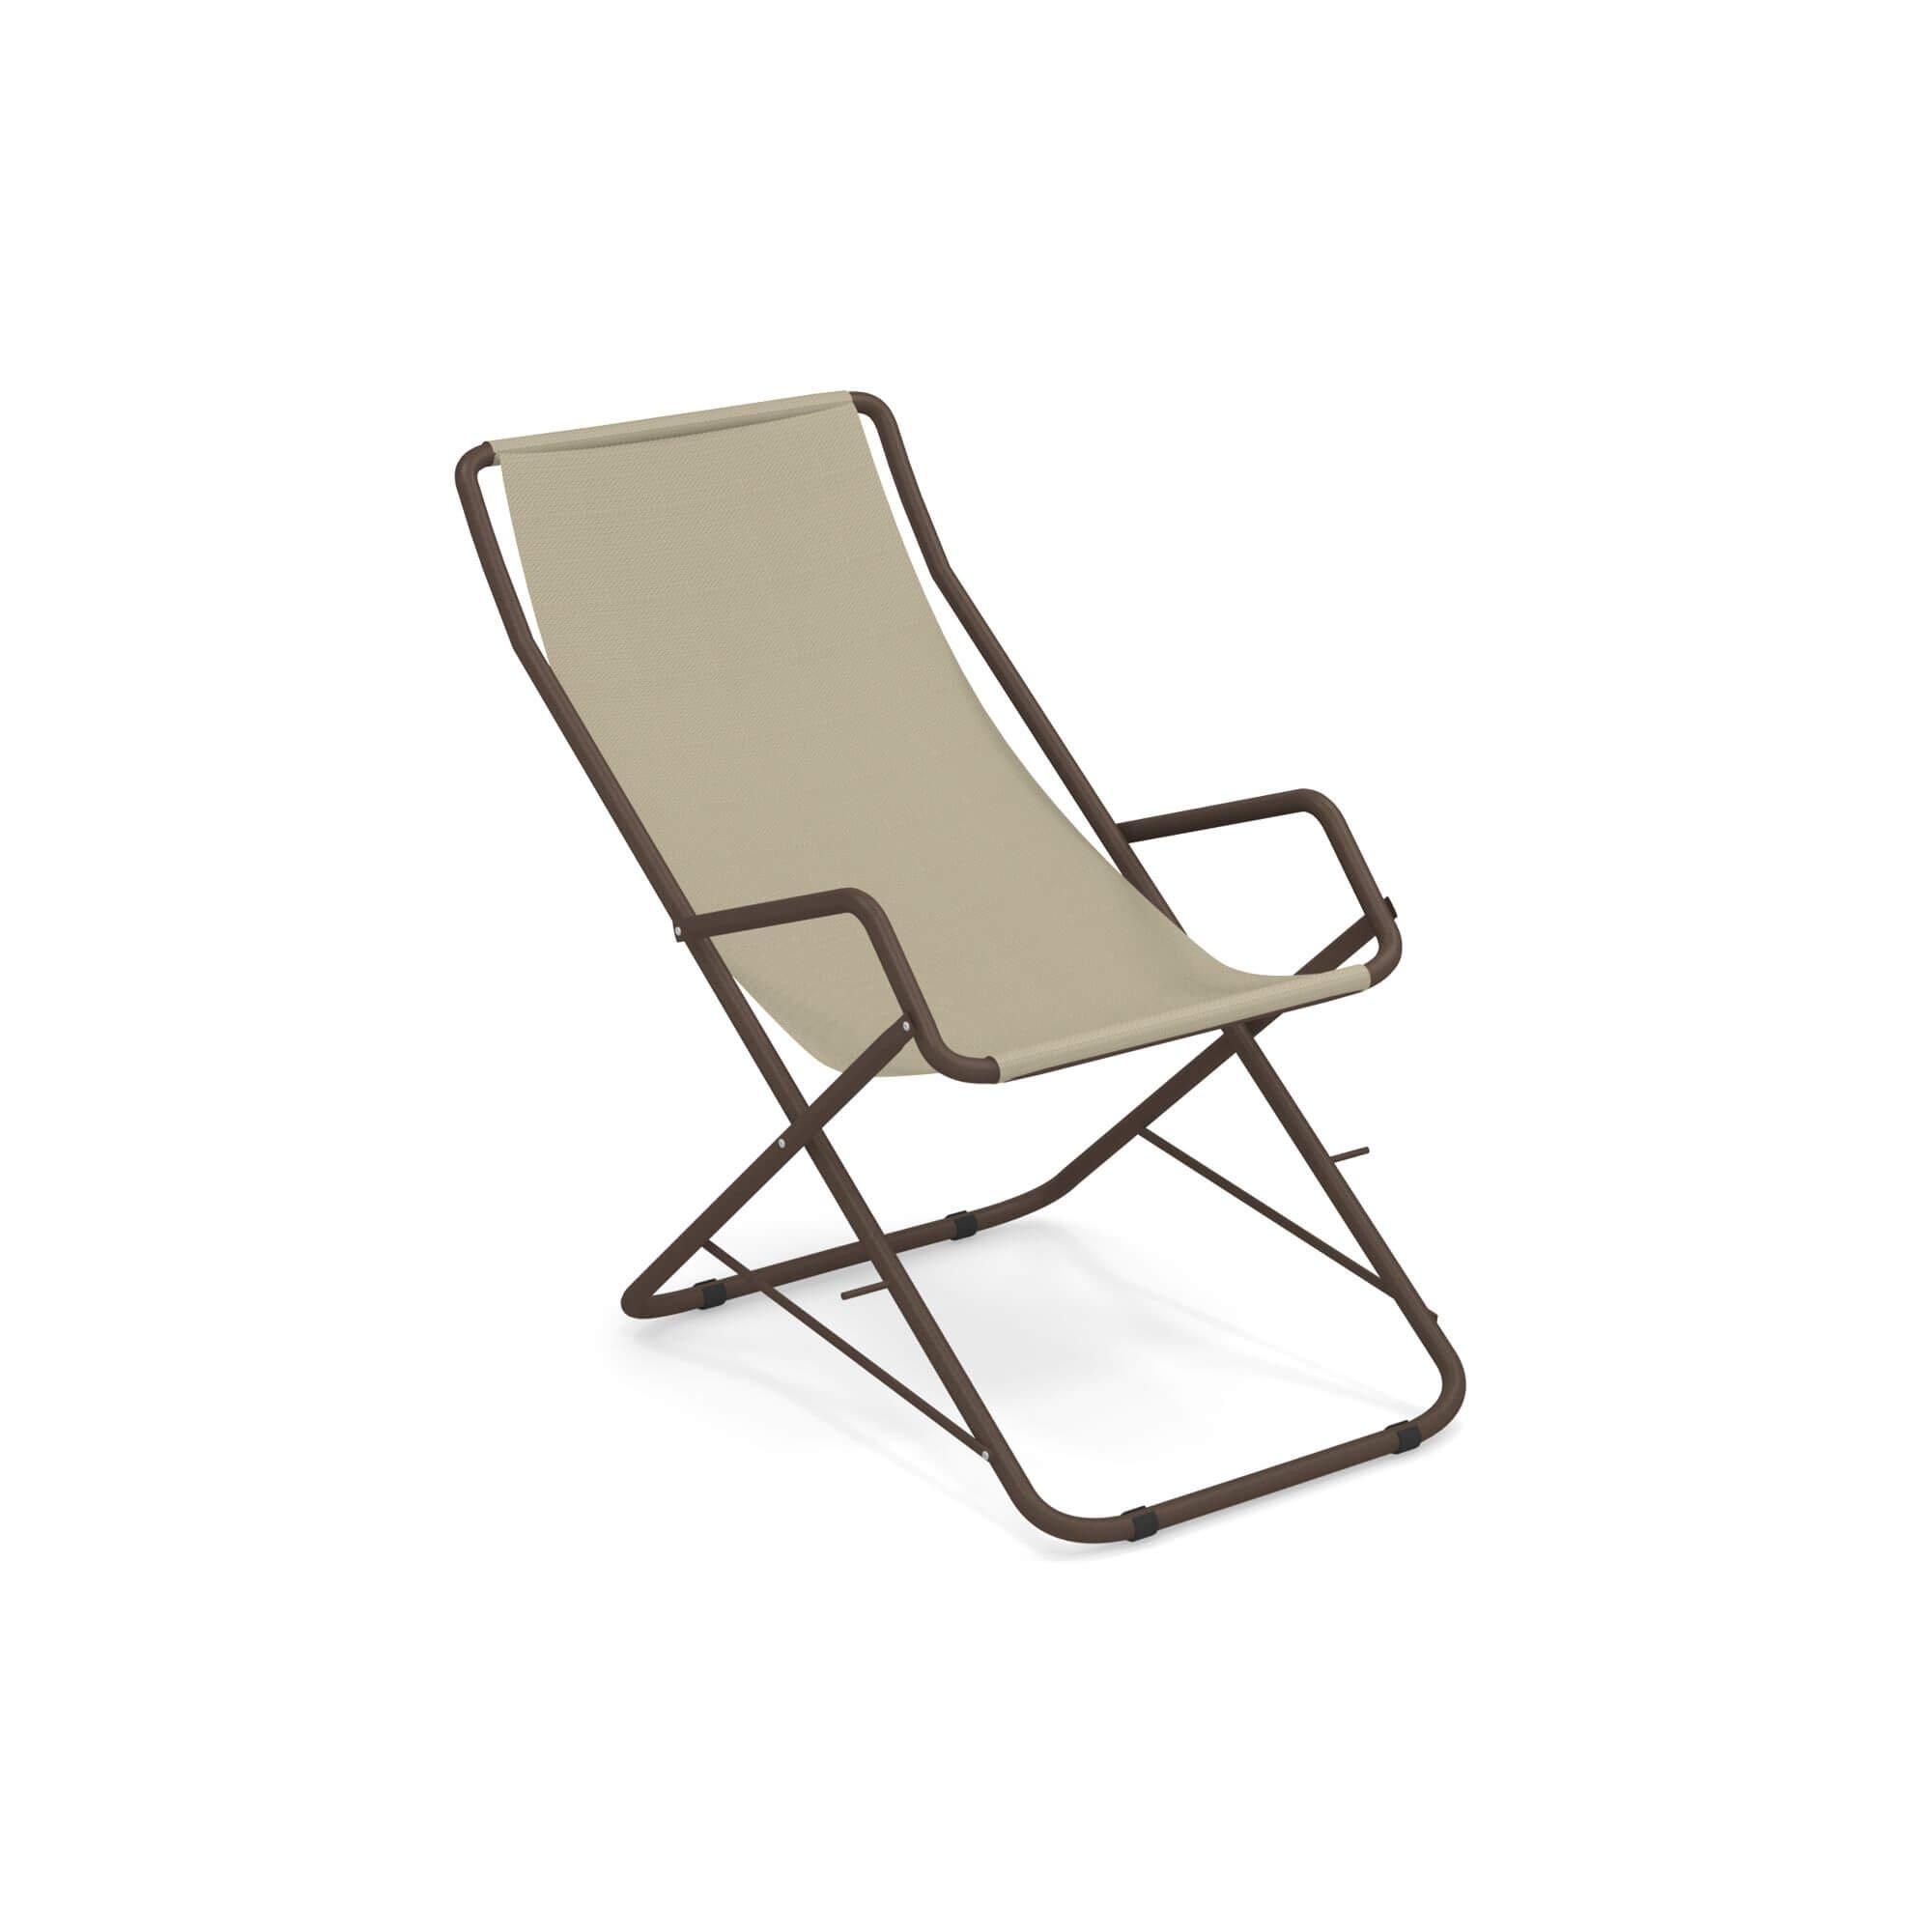 Bahama Chair lounge from Emu, designed by EMU Design Studio